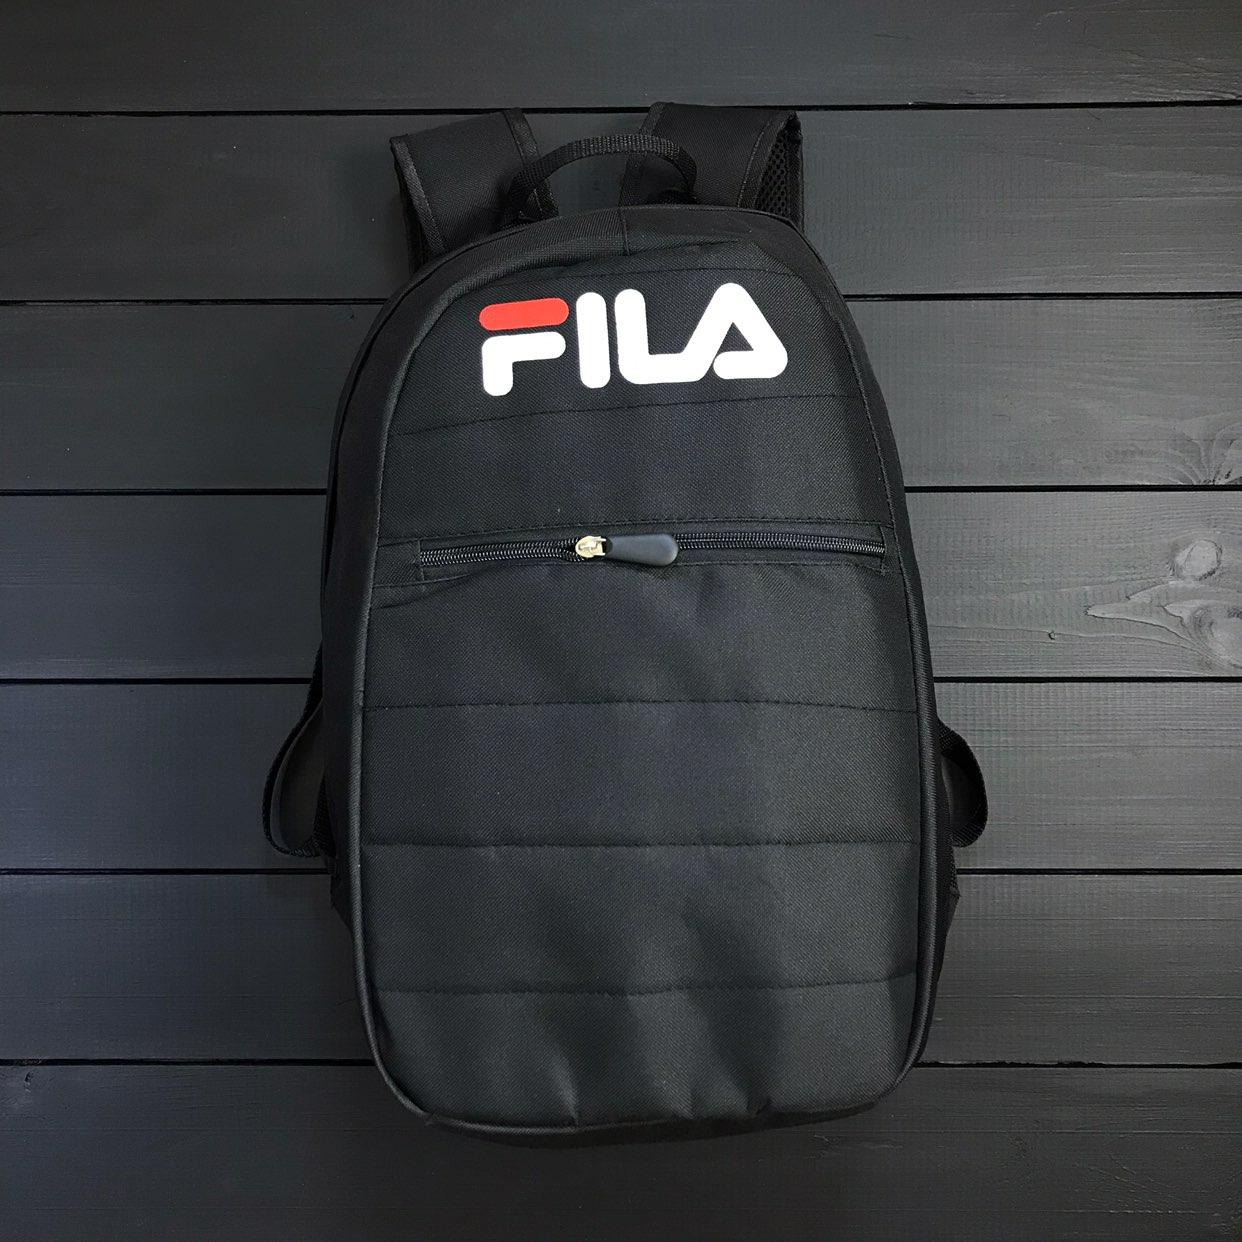 e4199a810112 Спортивный Рюкзак FILA Фила (реплика) - Интернет Магазин